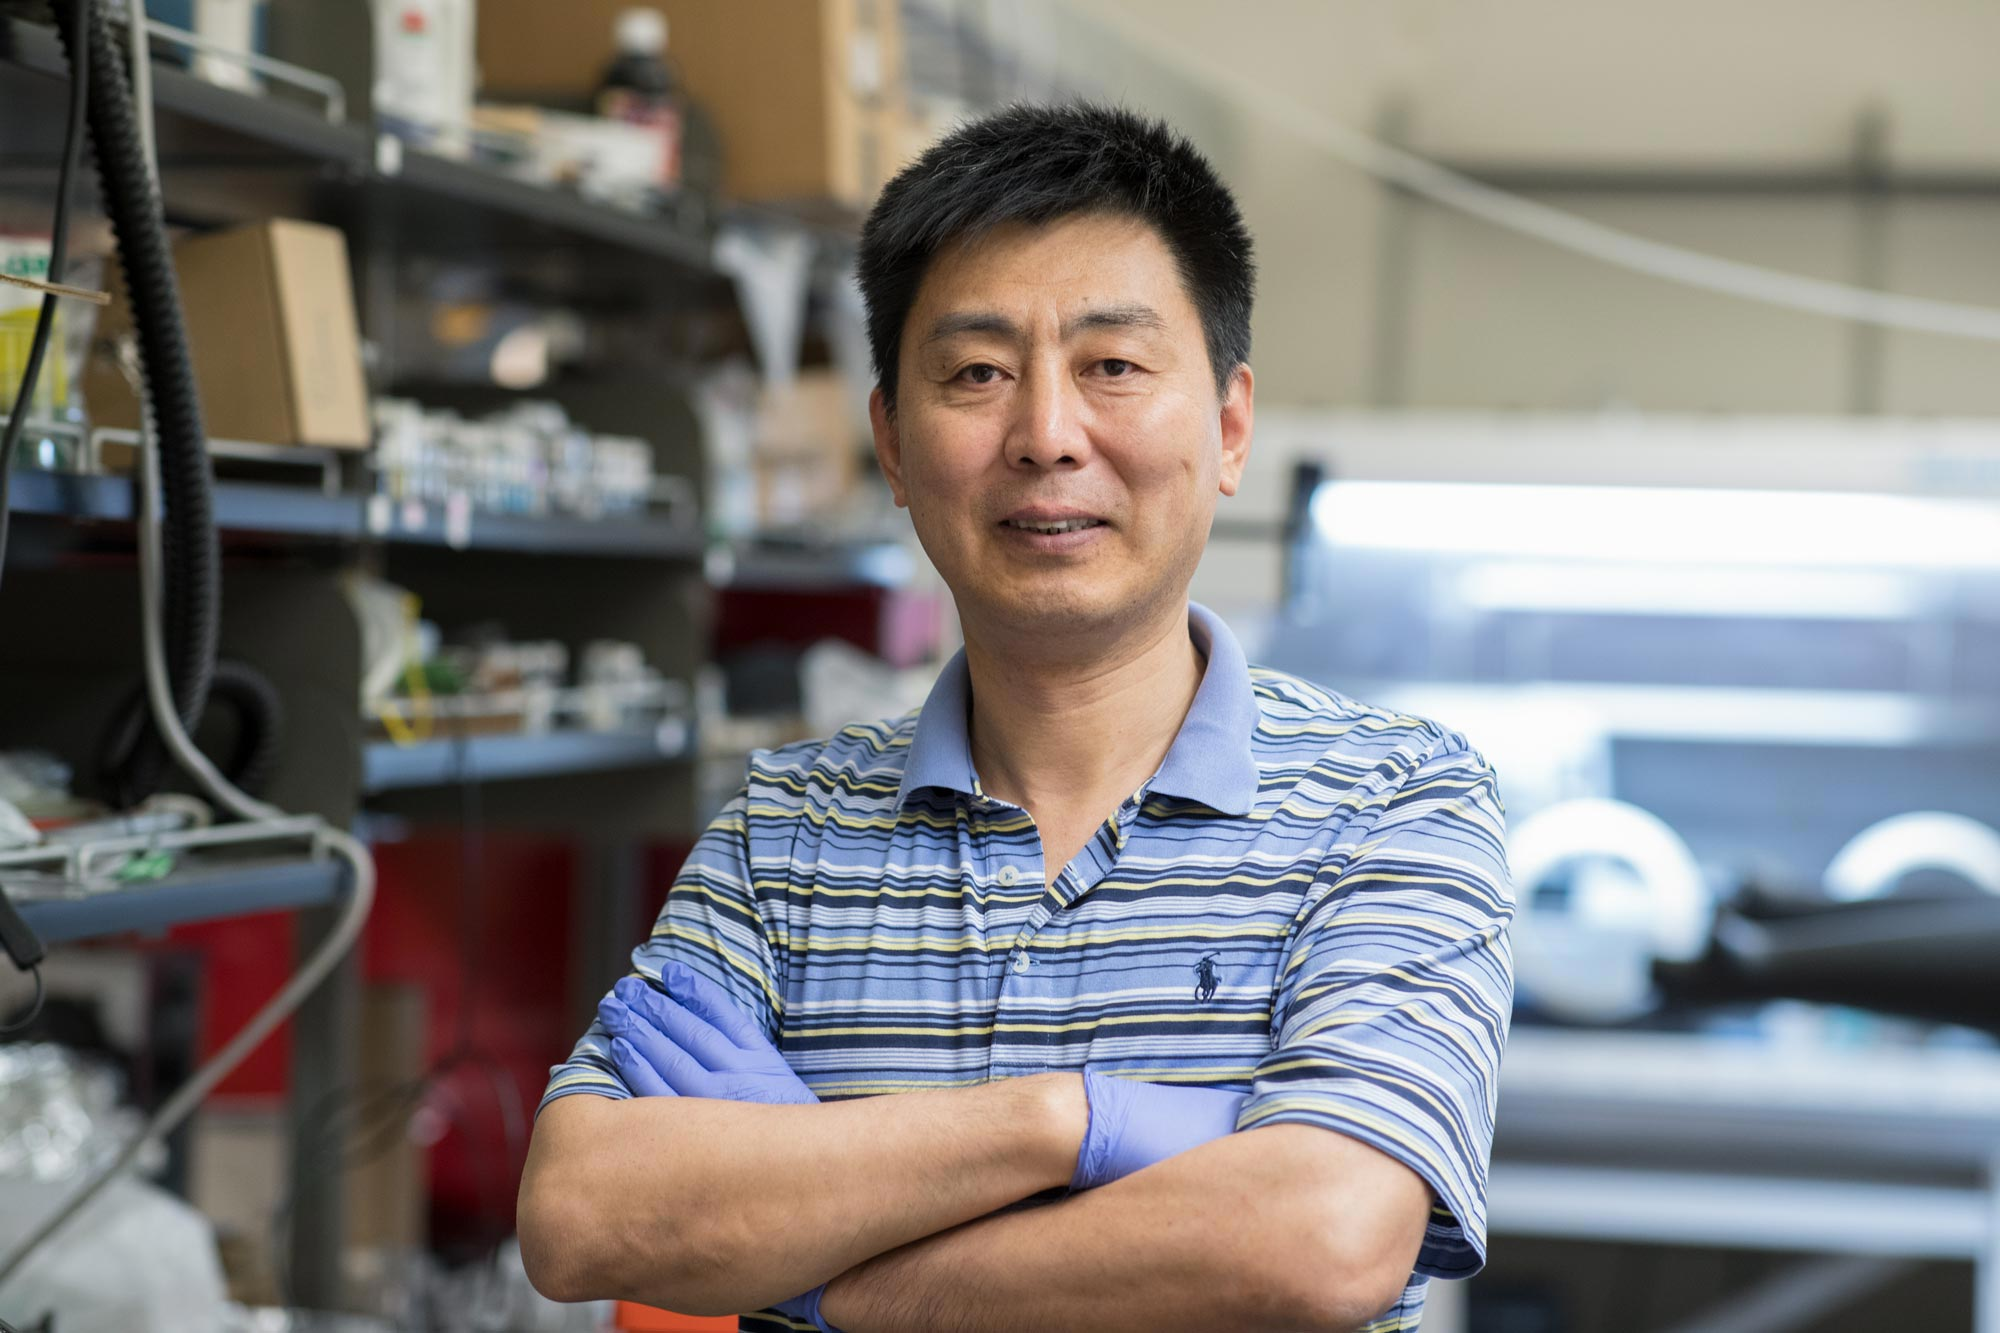 Xiaodong (Chris) Li's work spans manufacturing, materials and mechanics. (Photo by Dan Addison, University Communications)